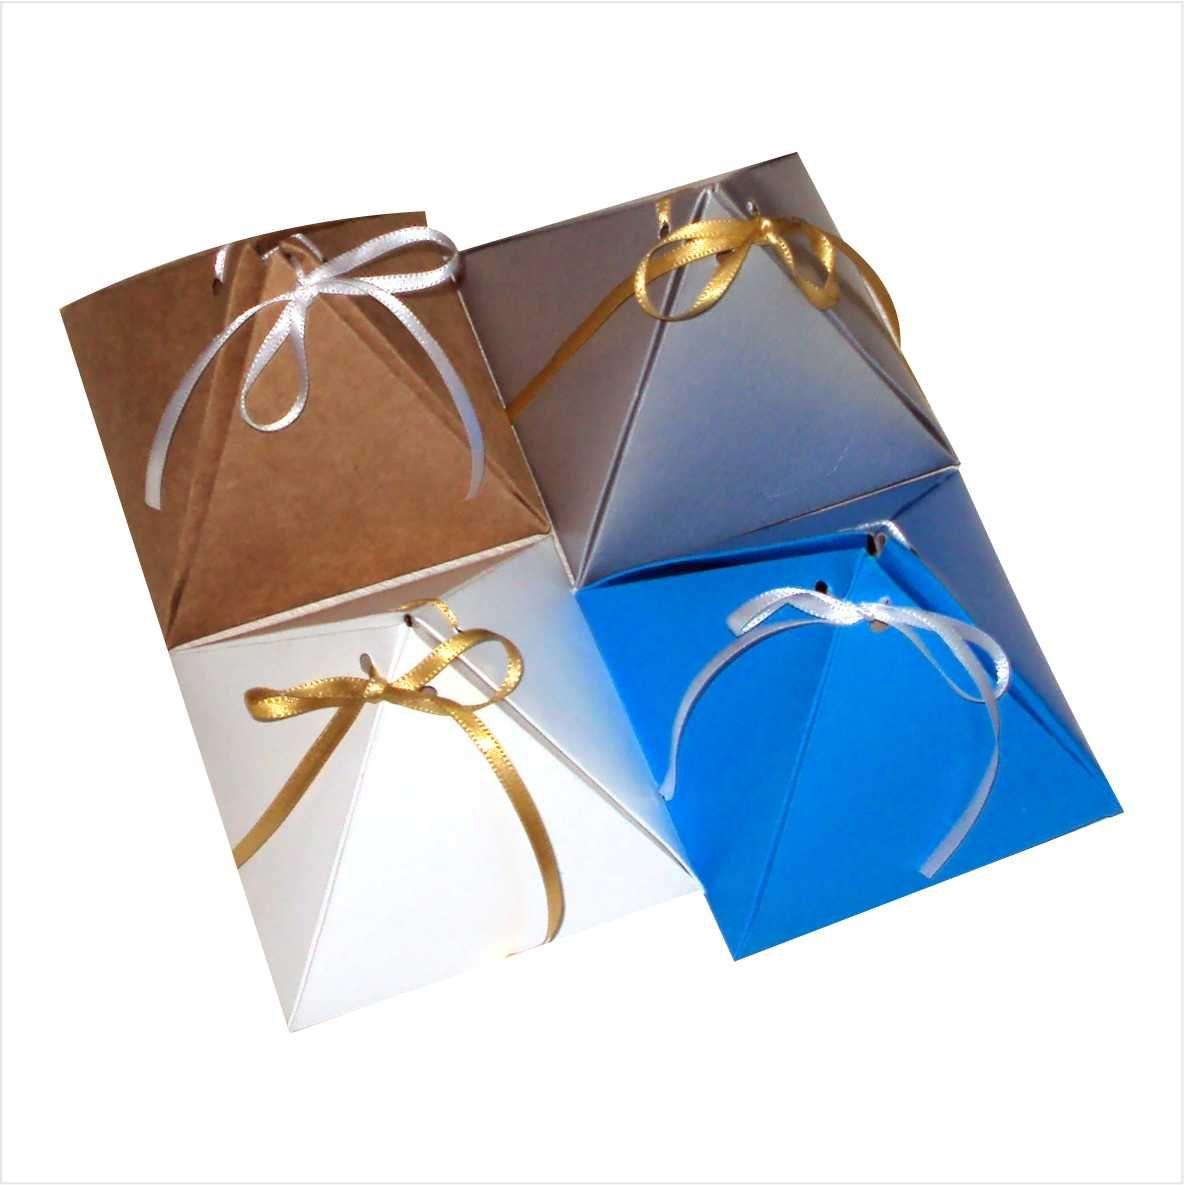 Caixa pirâmide pequena - 10 unidades